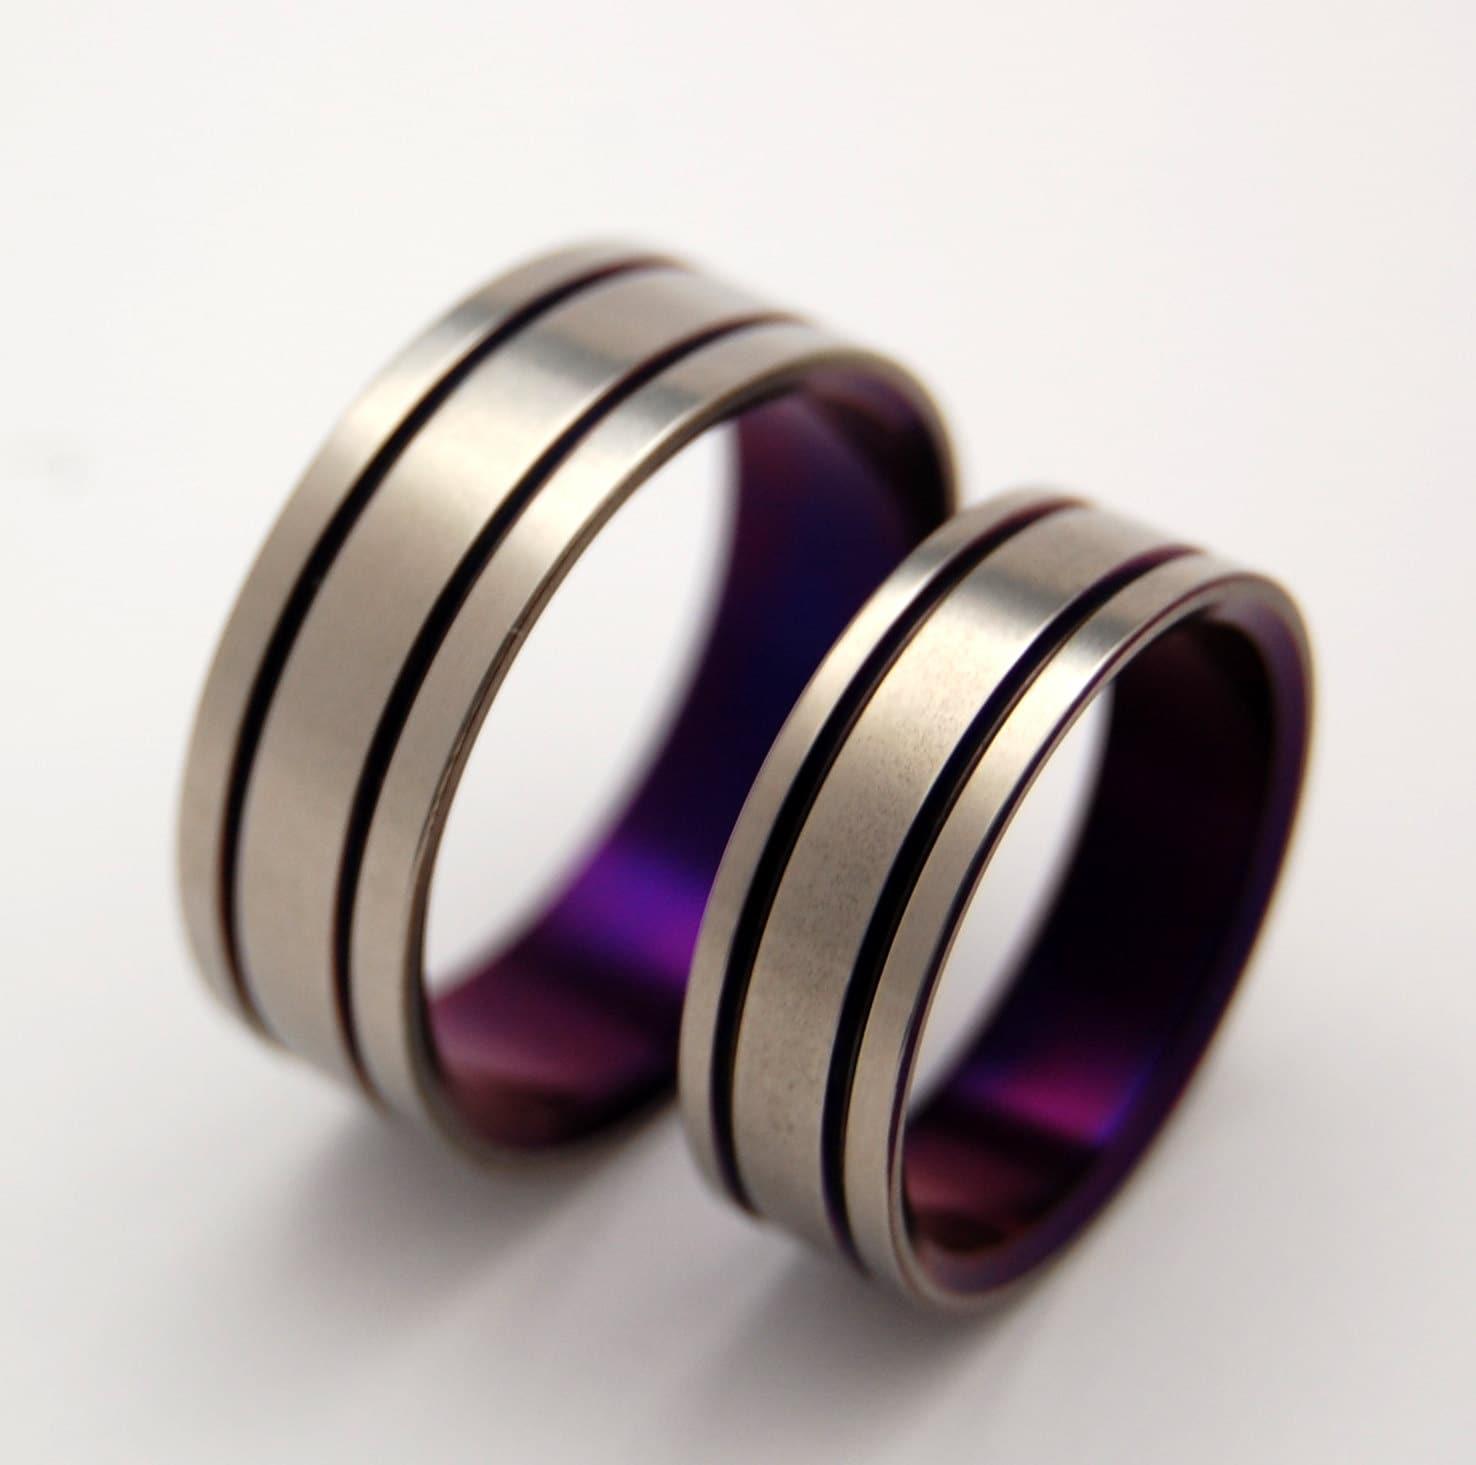 mens titanium ring mens wedding rings titanium Titanium Wedding Band Set purple wedding ring mens ring womens ring handmade ring custom made ring matching wedding set ALMA MATER